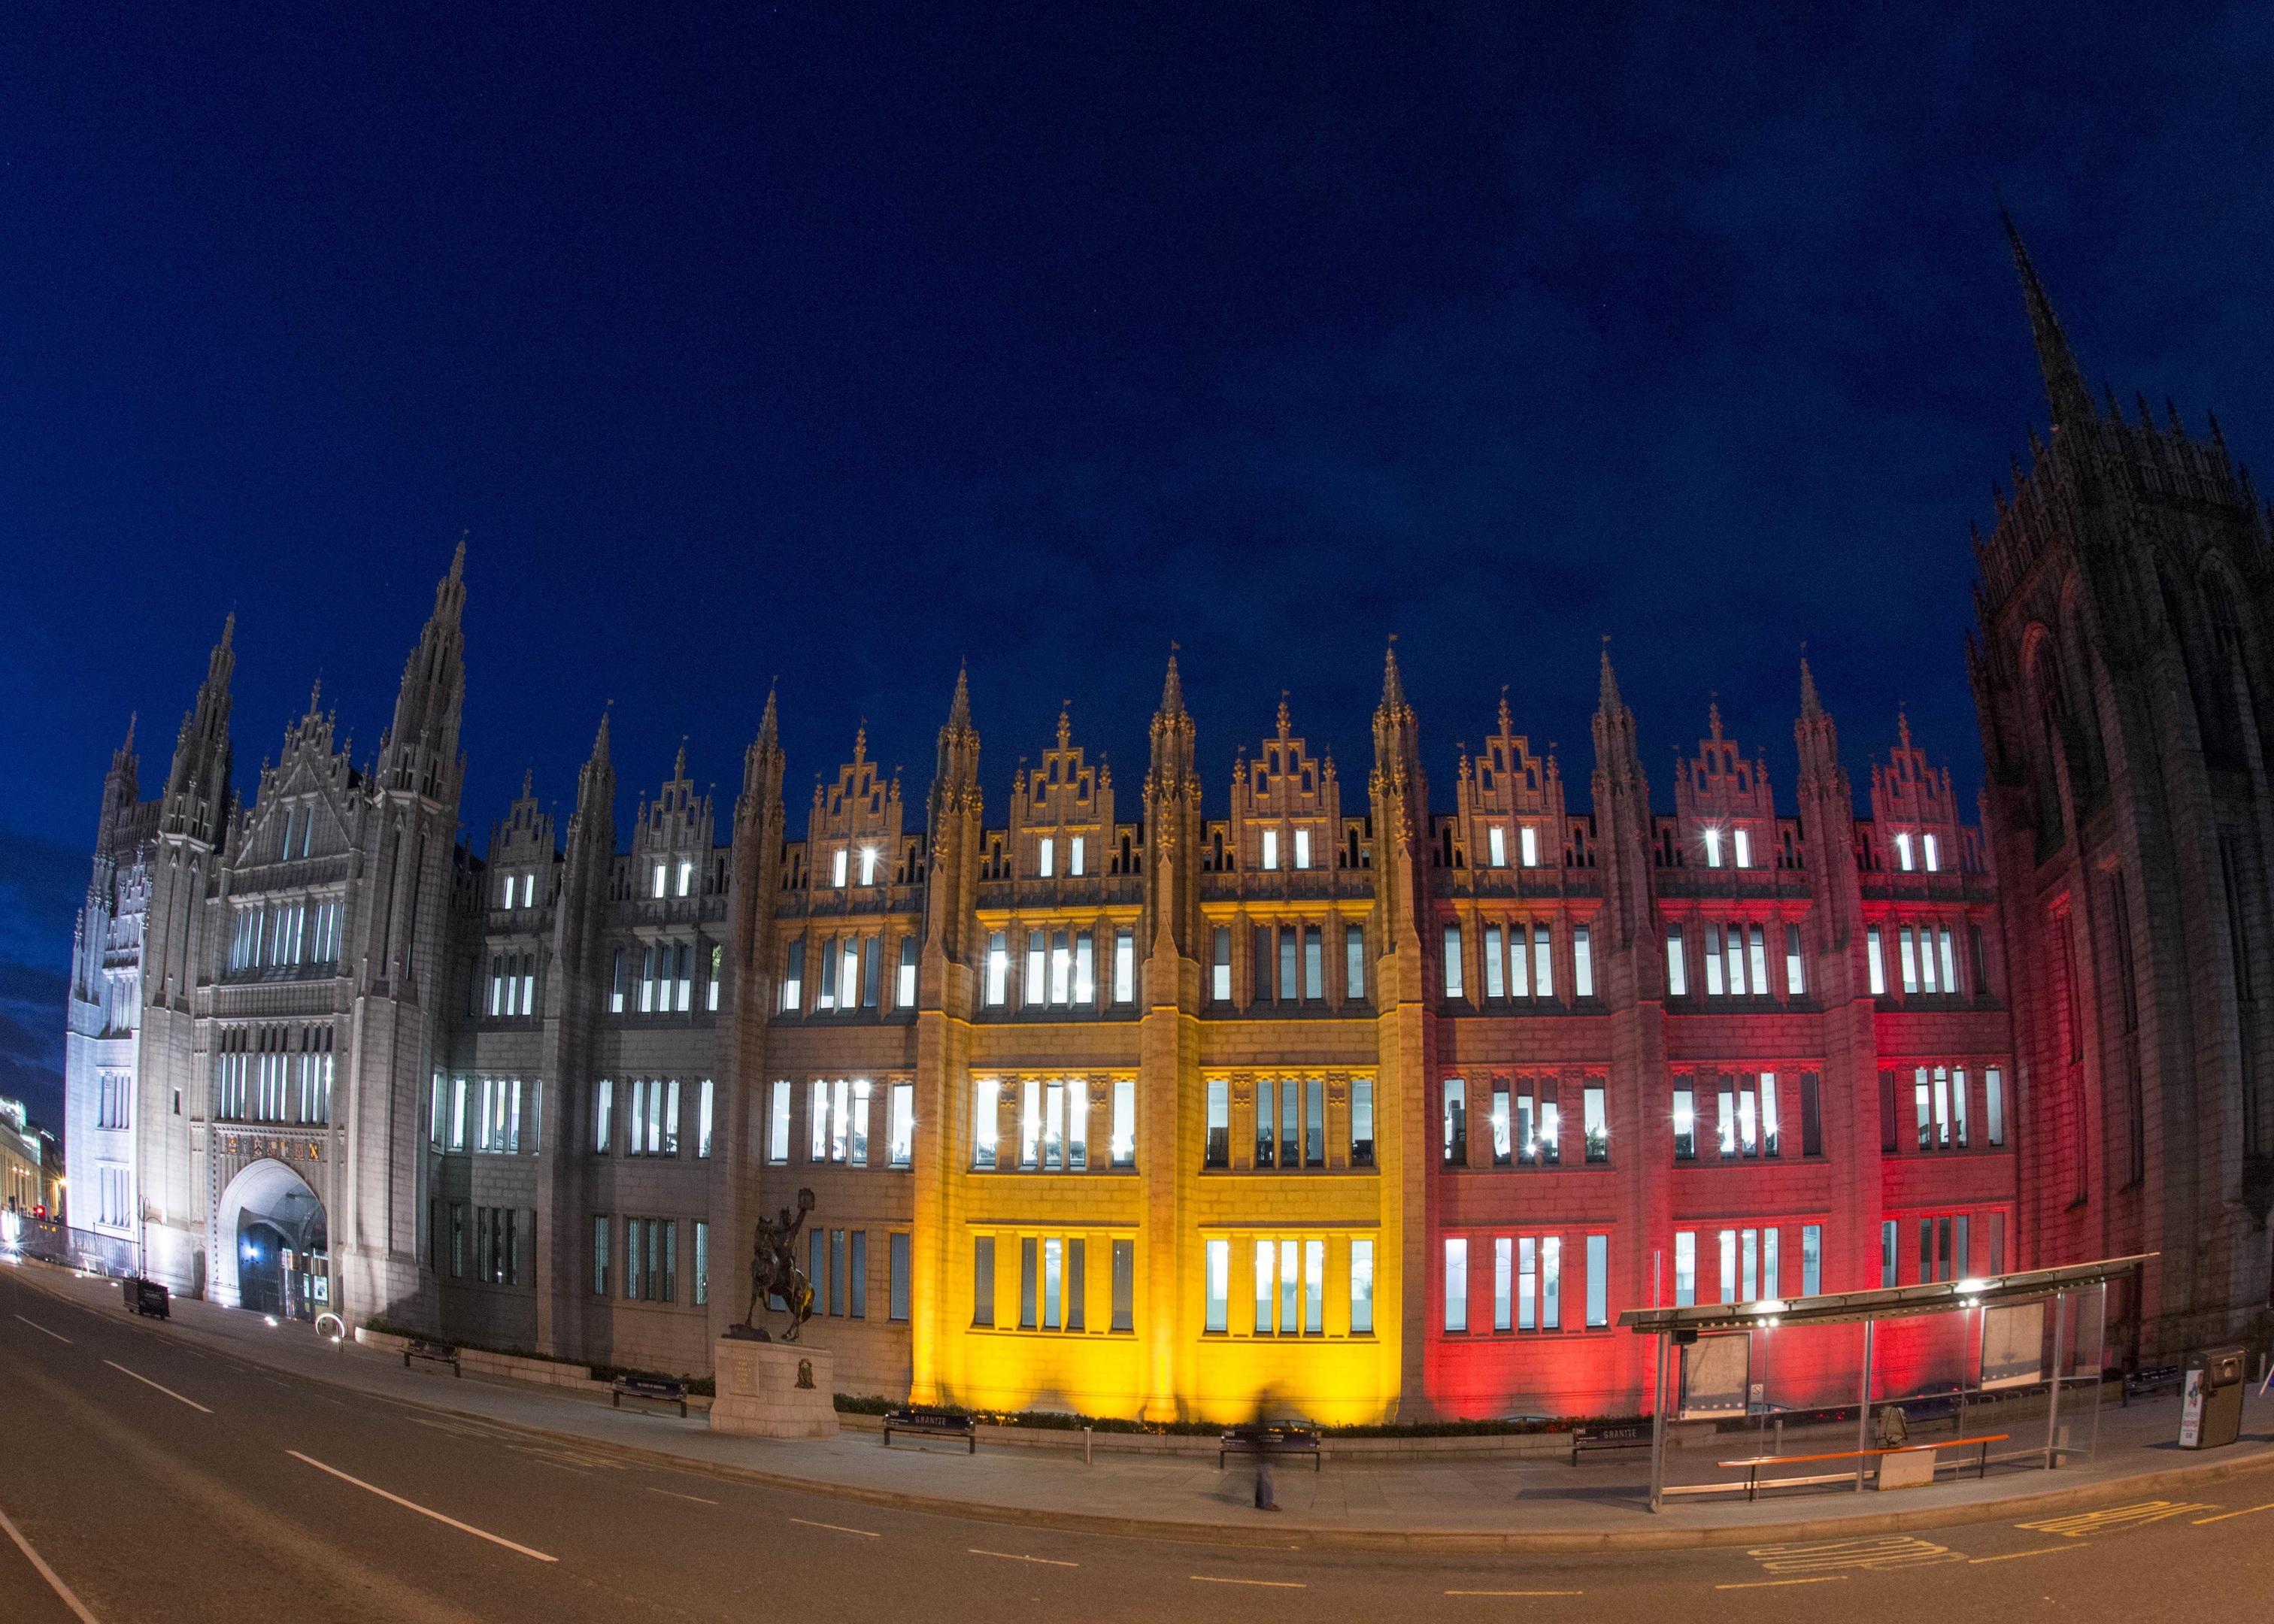 23/03/16 Marischal lit up fwith colours of Belgium flag